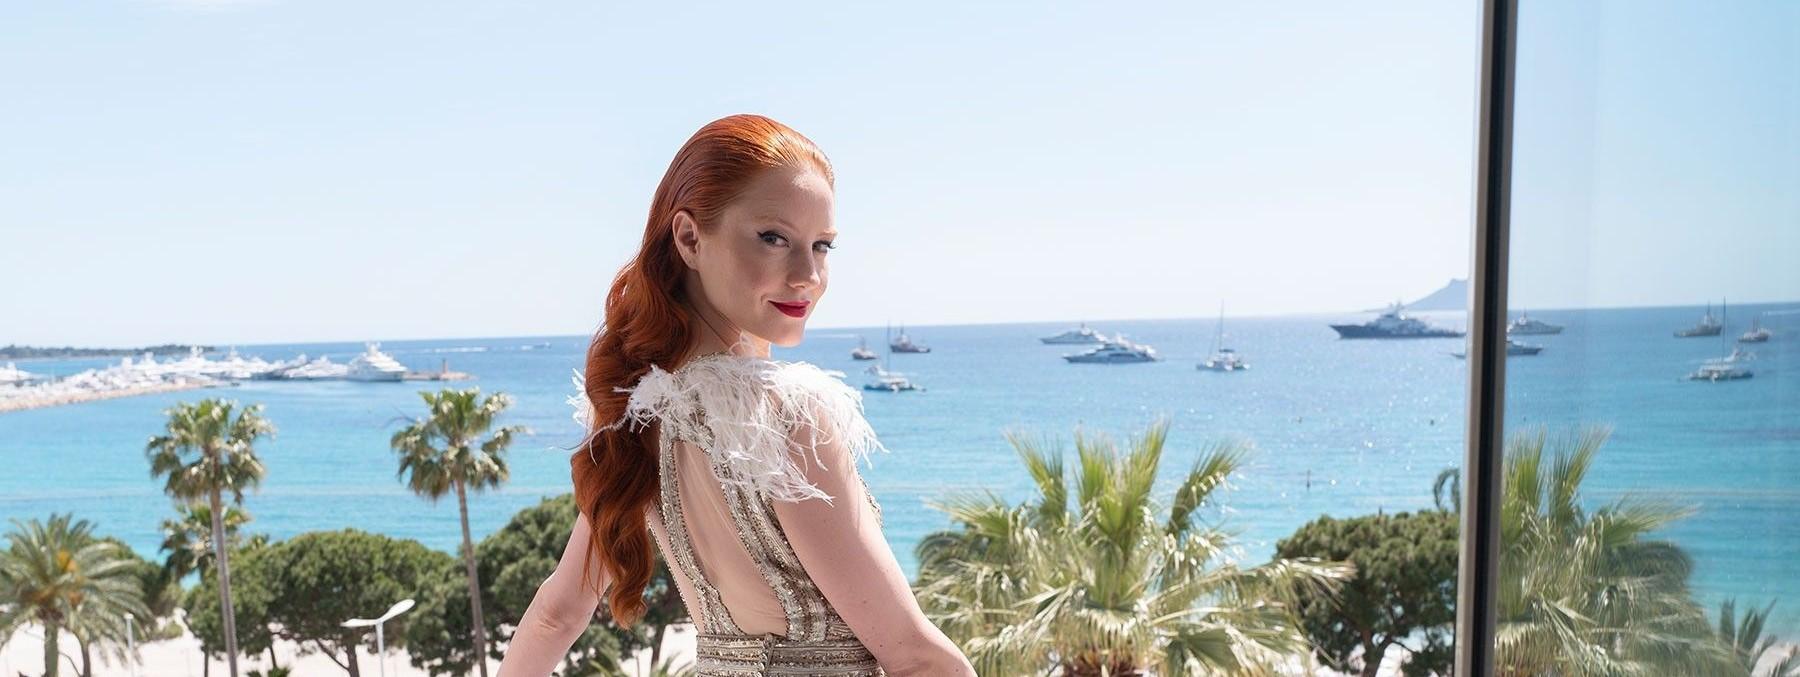 Décryptage coiffure Cannes 2019 : le Mermaid Sleek de Barbara Meier